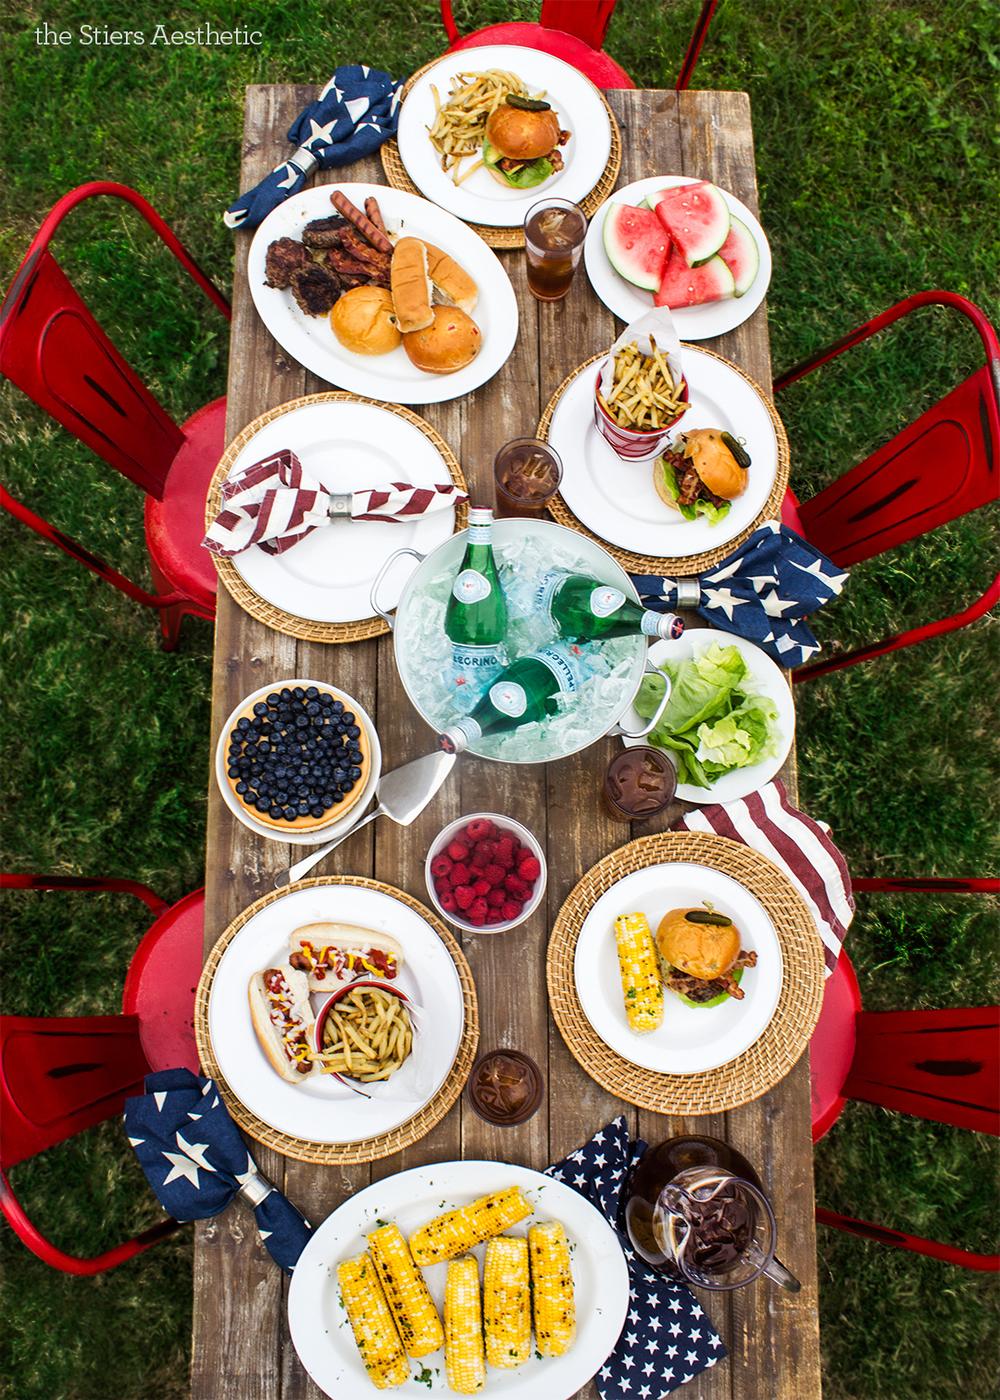 Patriotic Table Setting